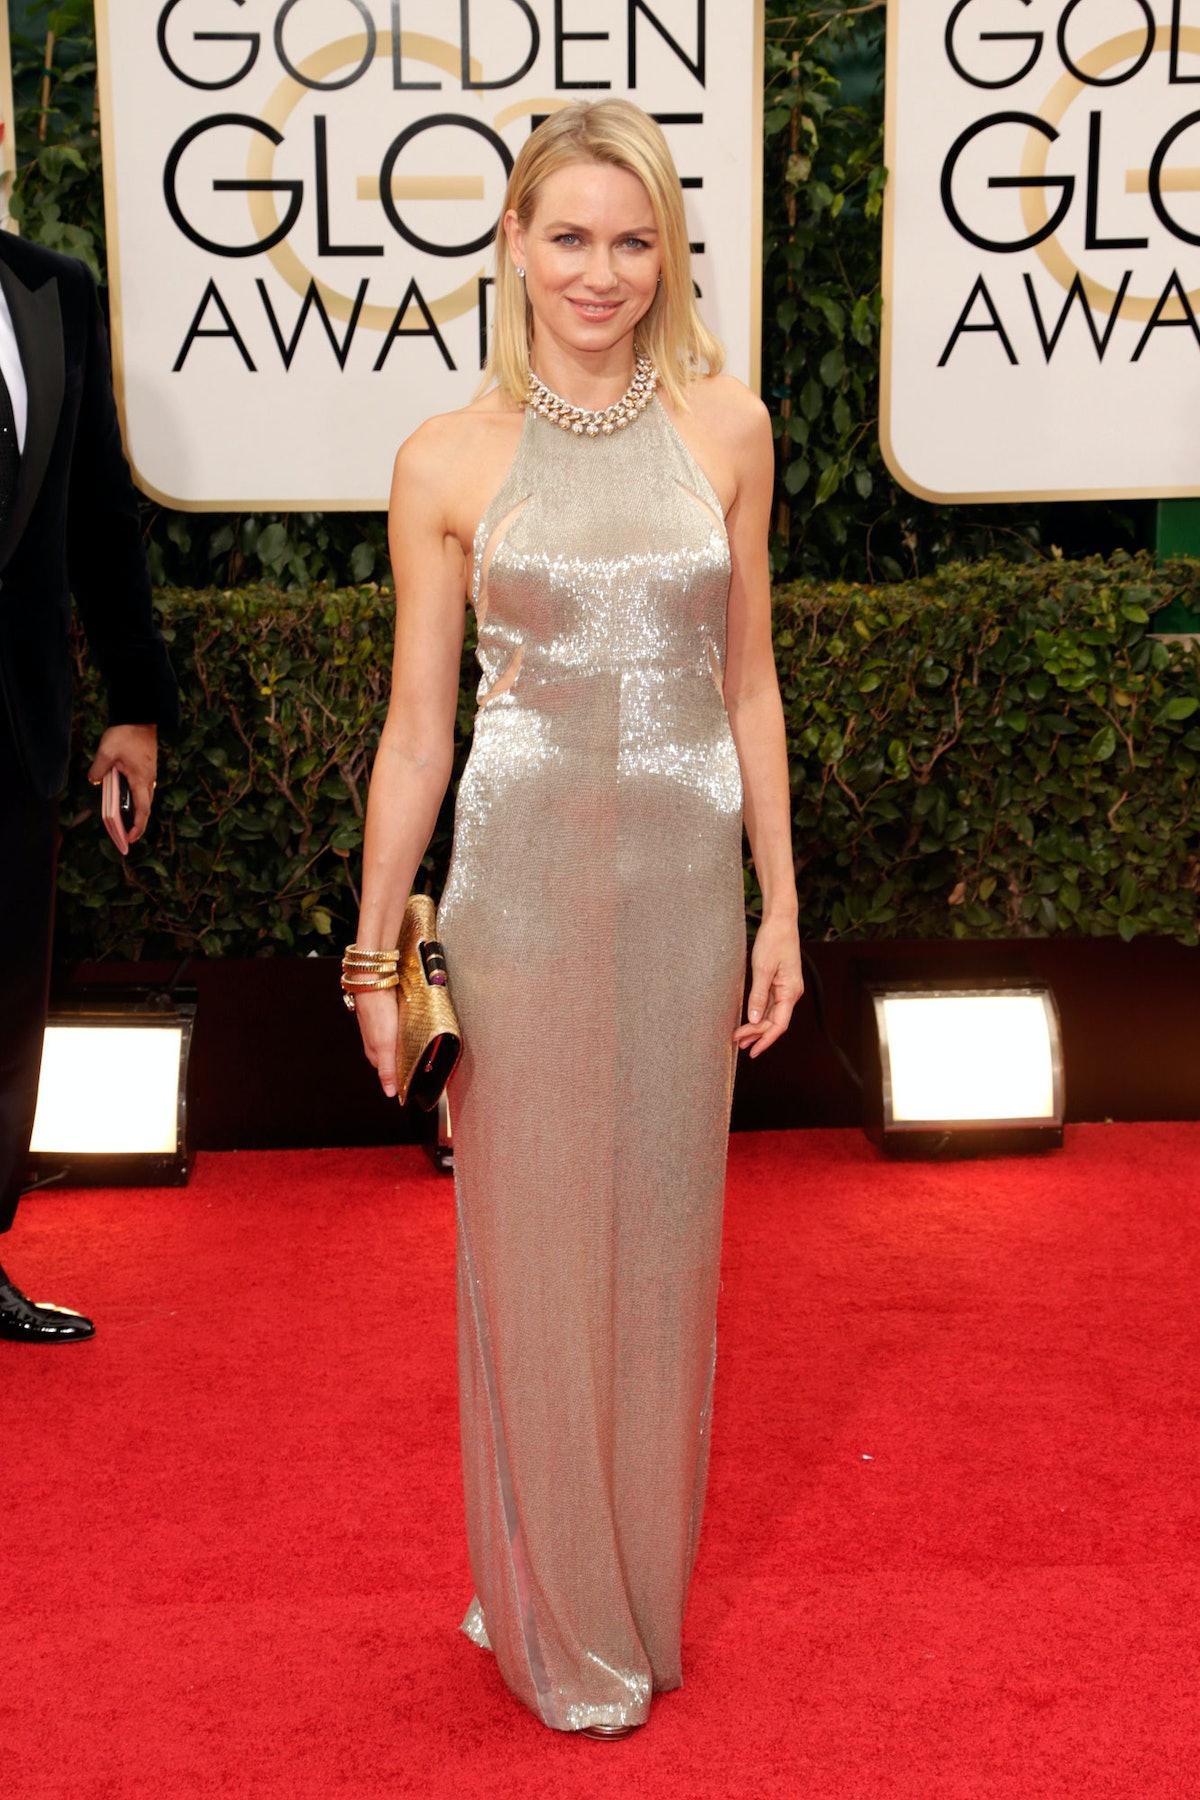 [Naomi Watts](http://www.wmagazine.com/people/best-dressed/2013/10/naomi-watts-princess-diana/) ooze...